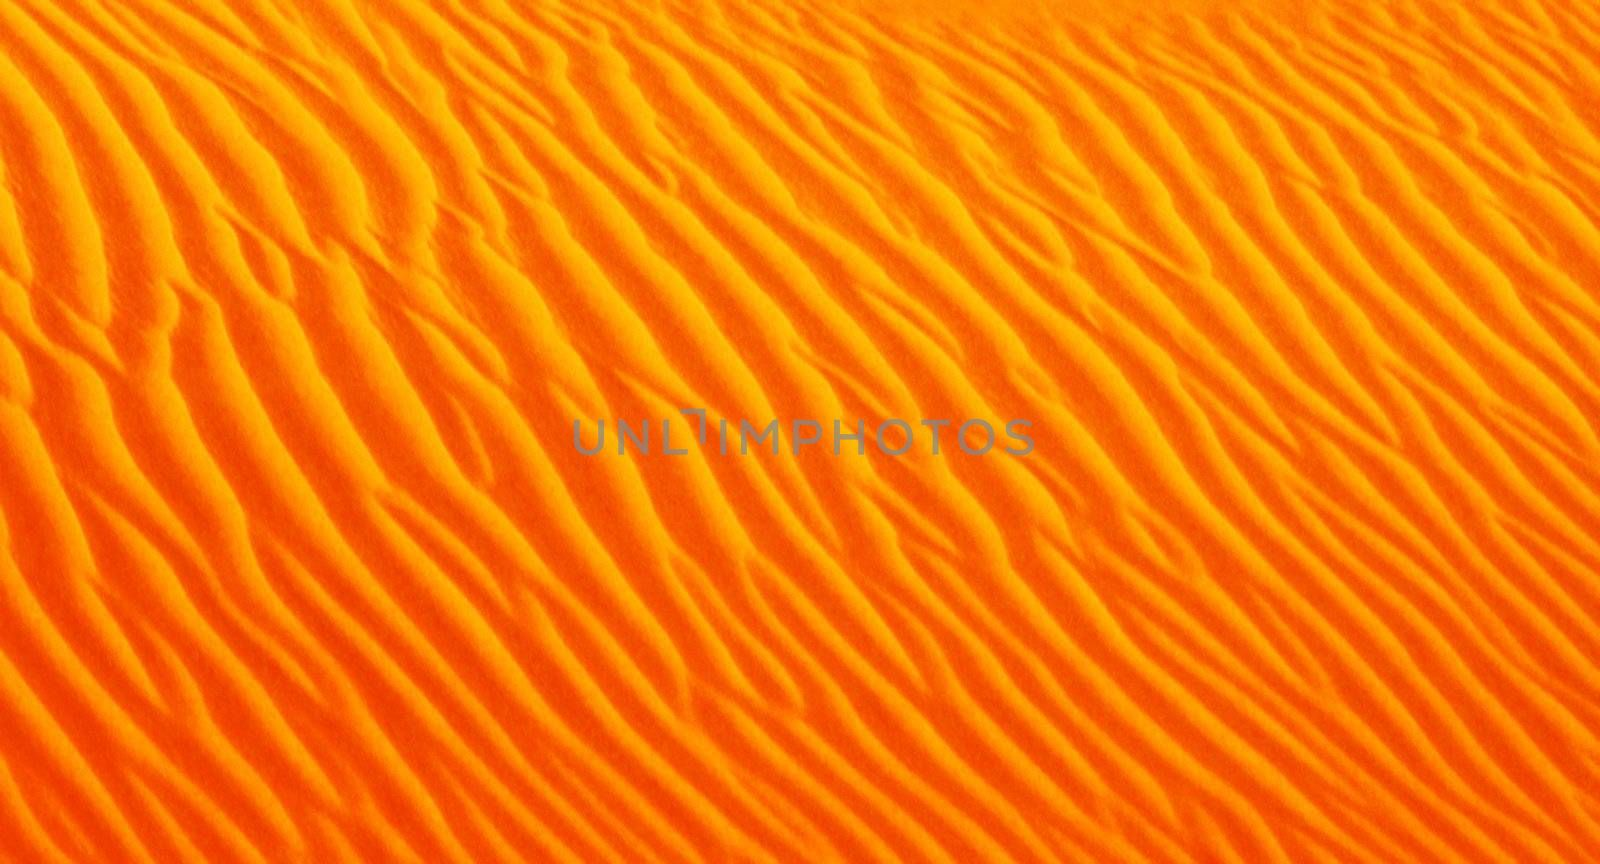 Sand texture pattern background